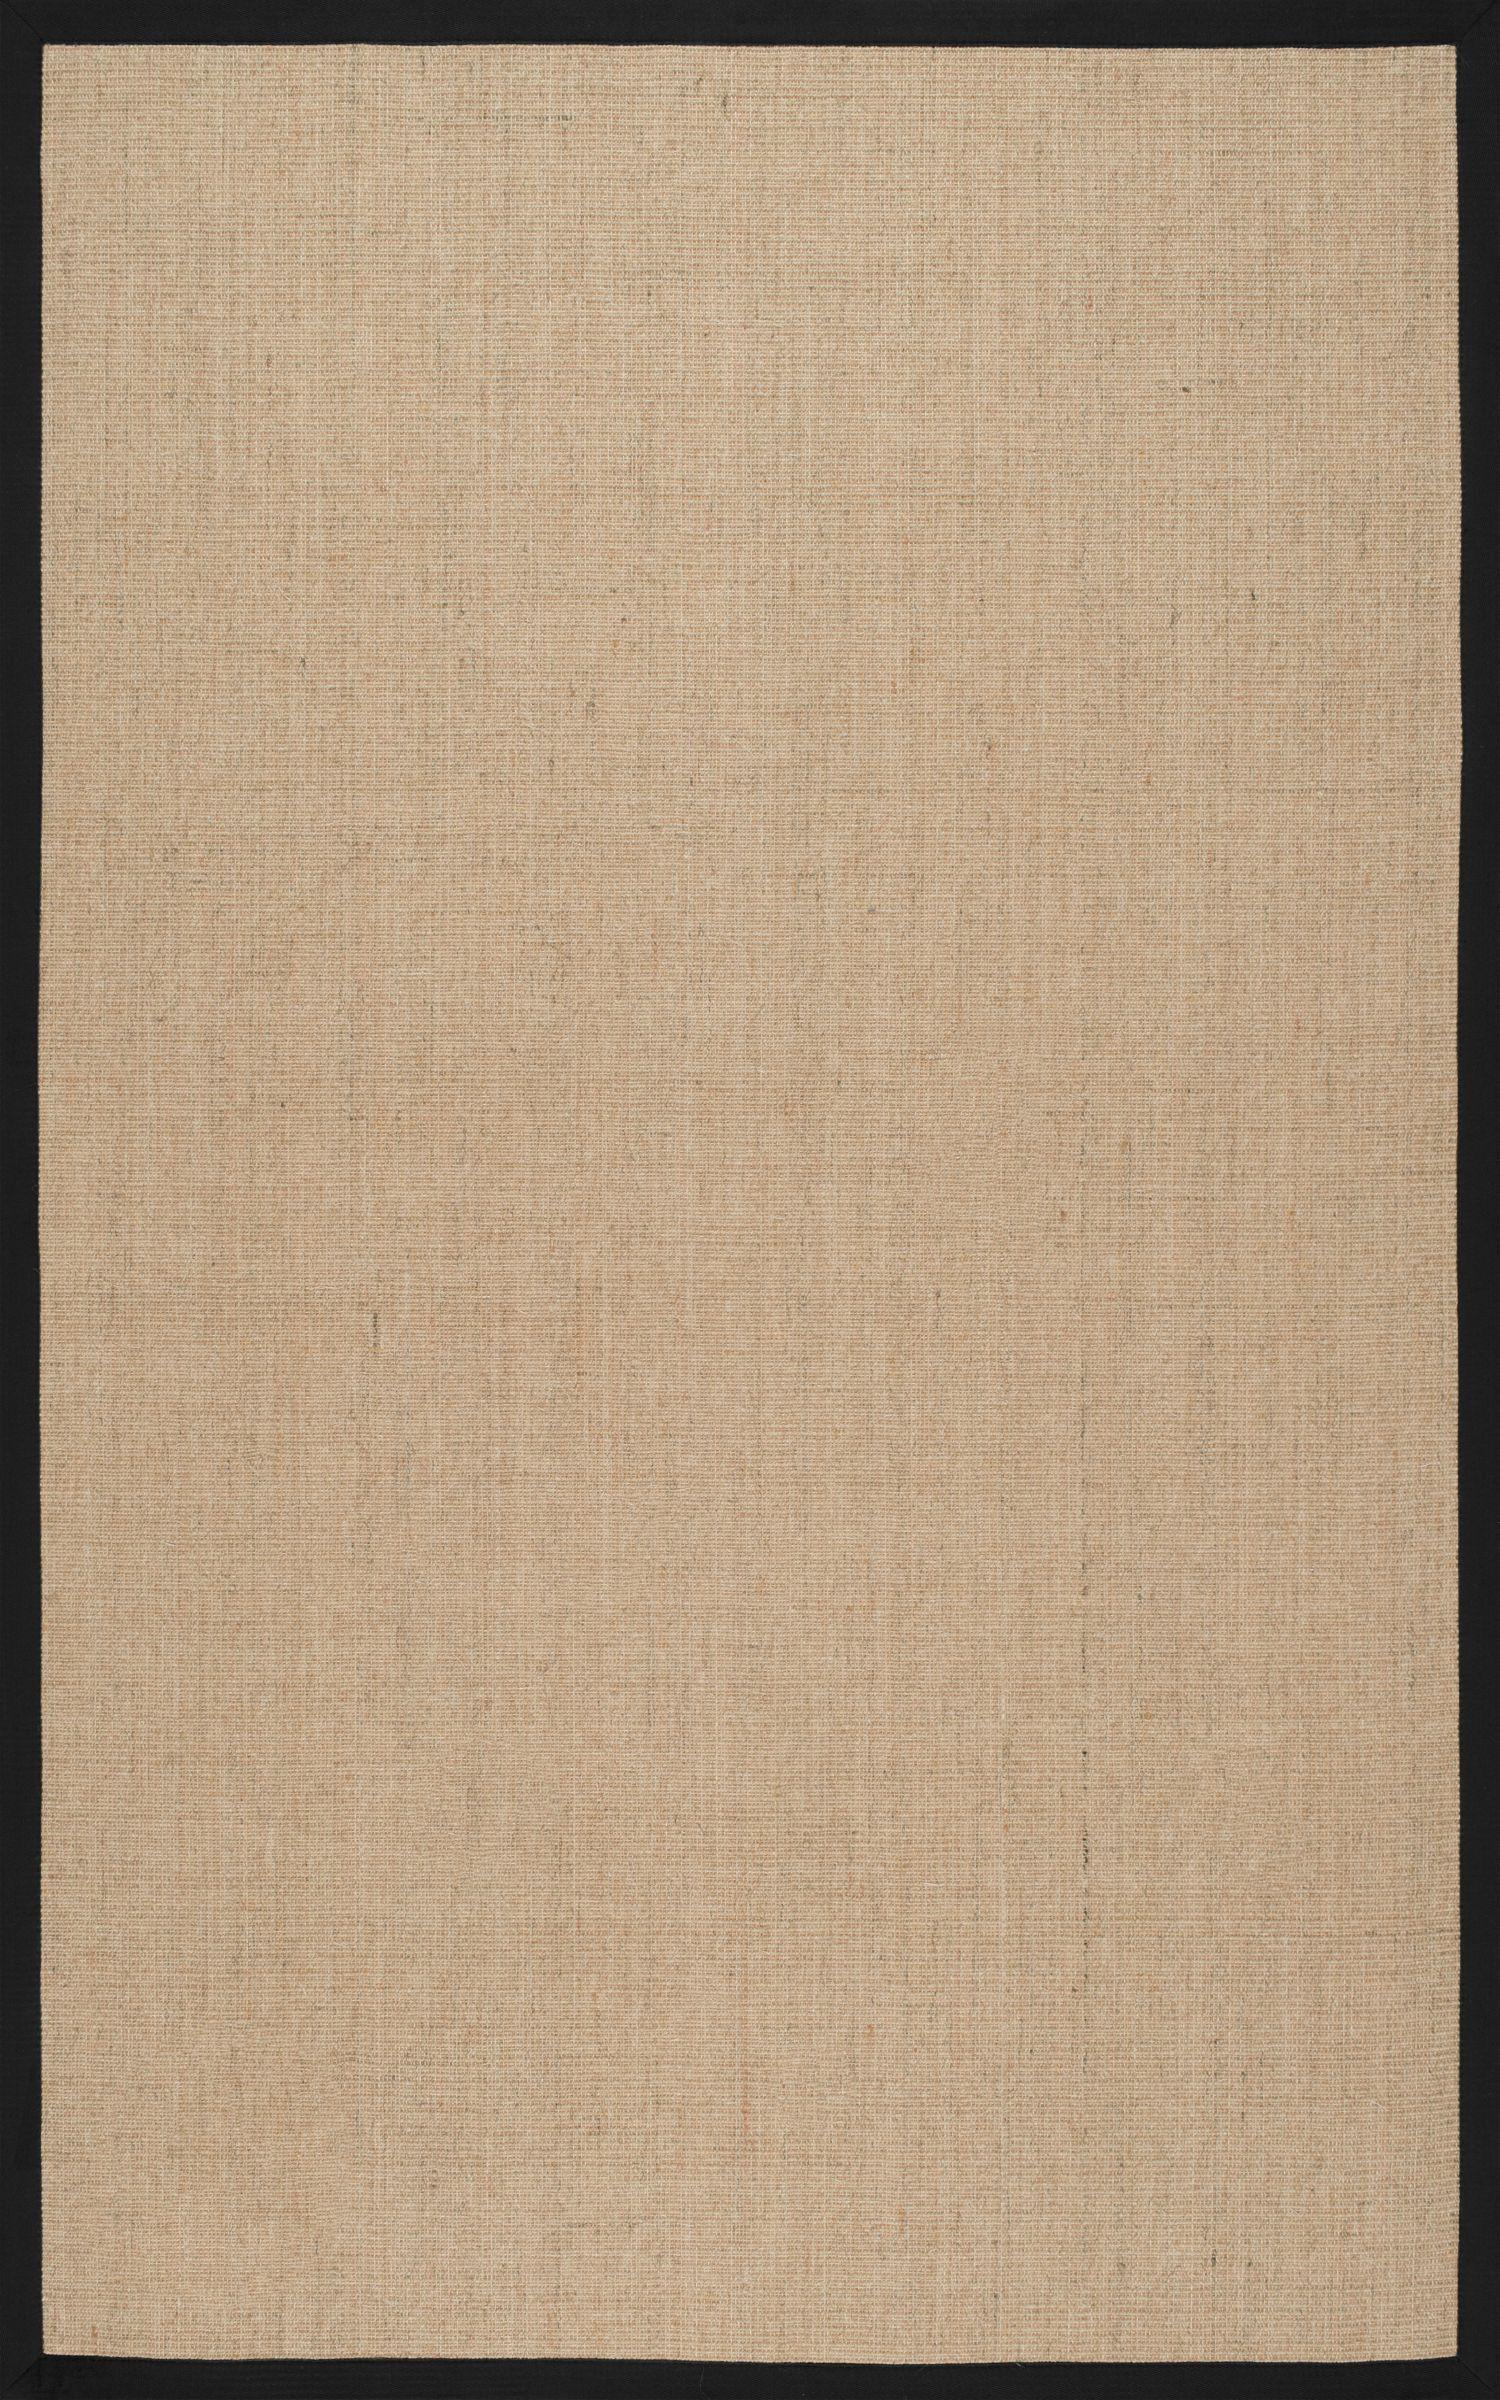 Alhambra Sand Area Rug Rug Size: Rectangle 5' x 8'